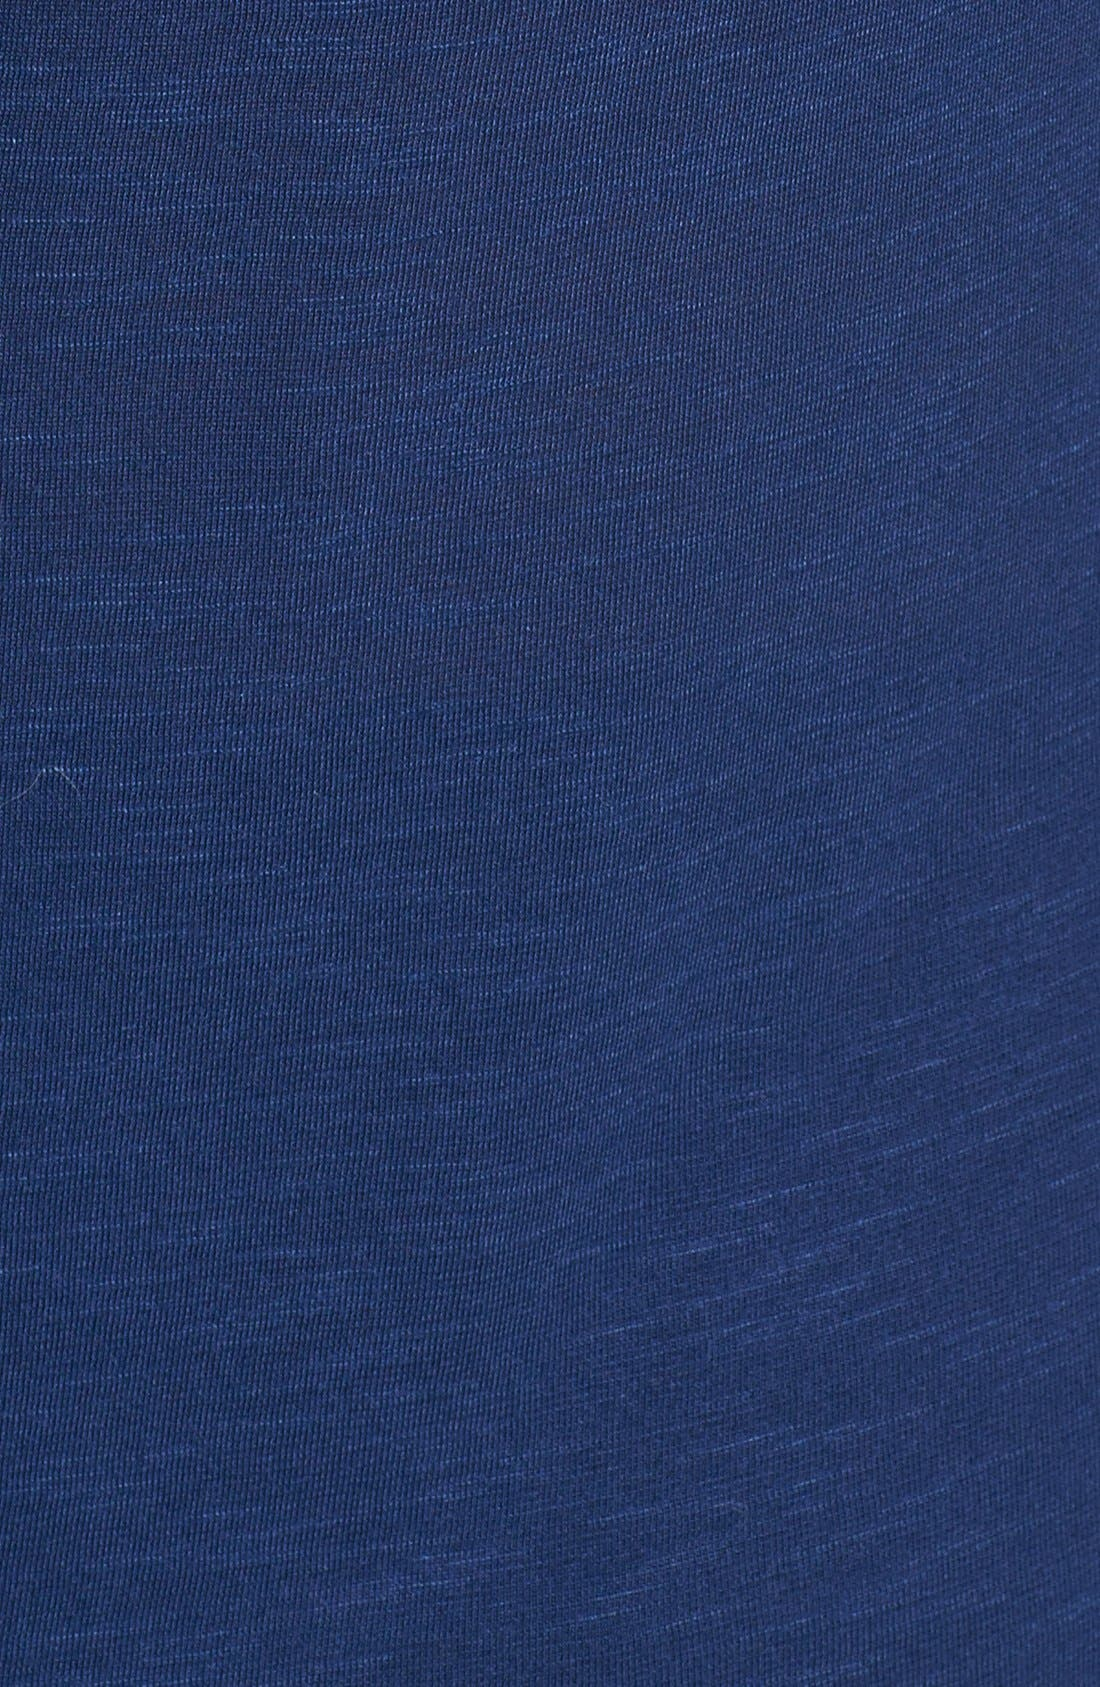 Alternate Image 3  - Topshop Drape Jersey Top